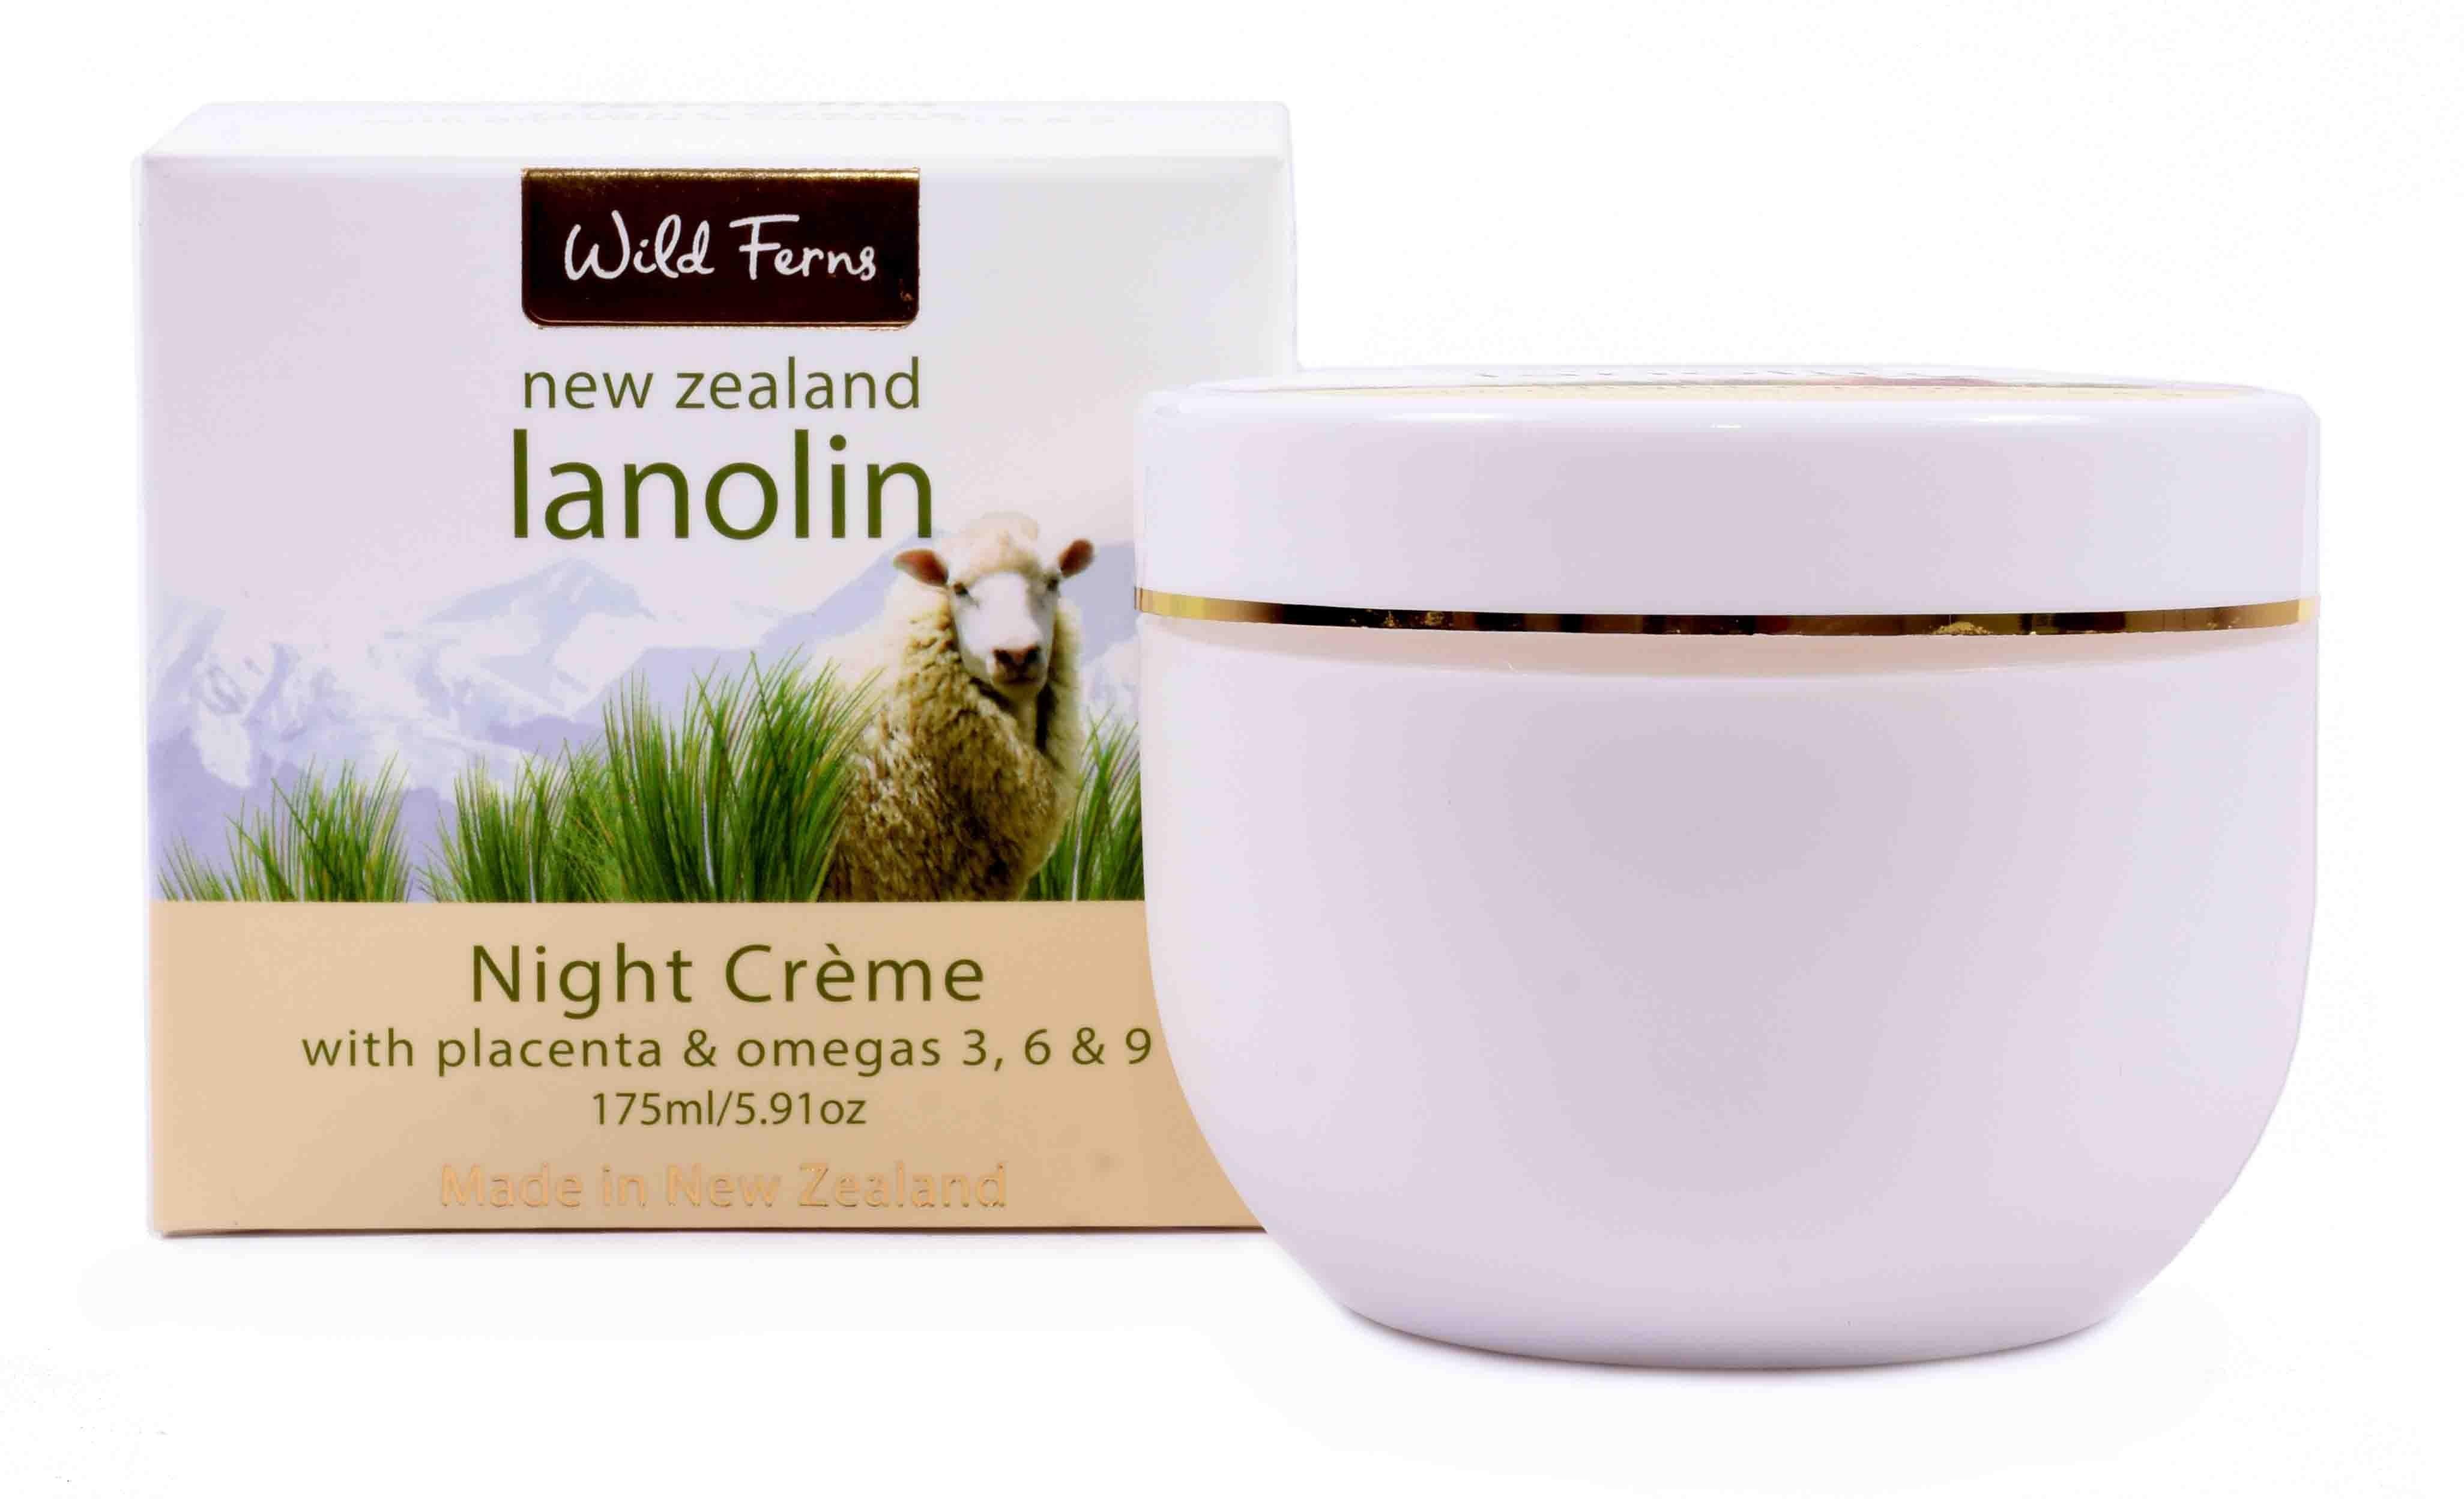 WILD FERNS LANOLIN NIGHT CREAM WITH PLACENTA & OMAGA'S 175 ML